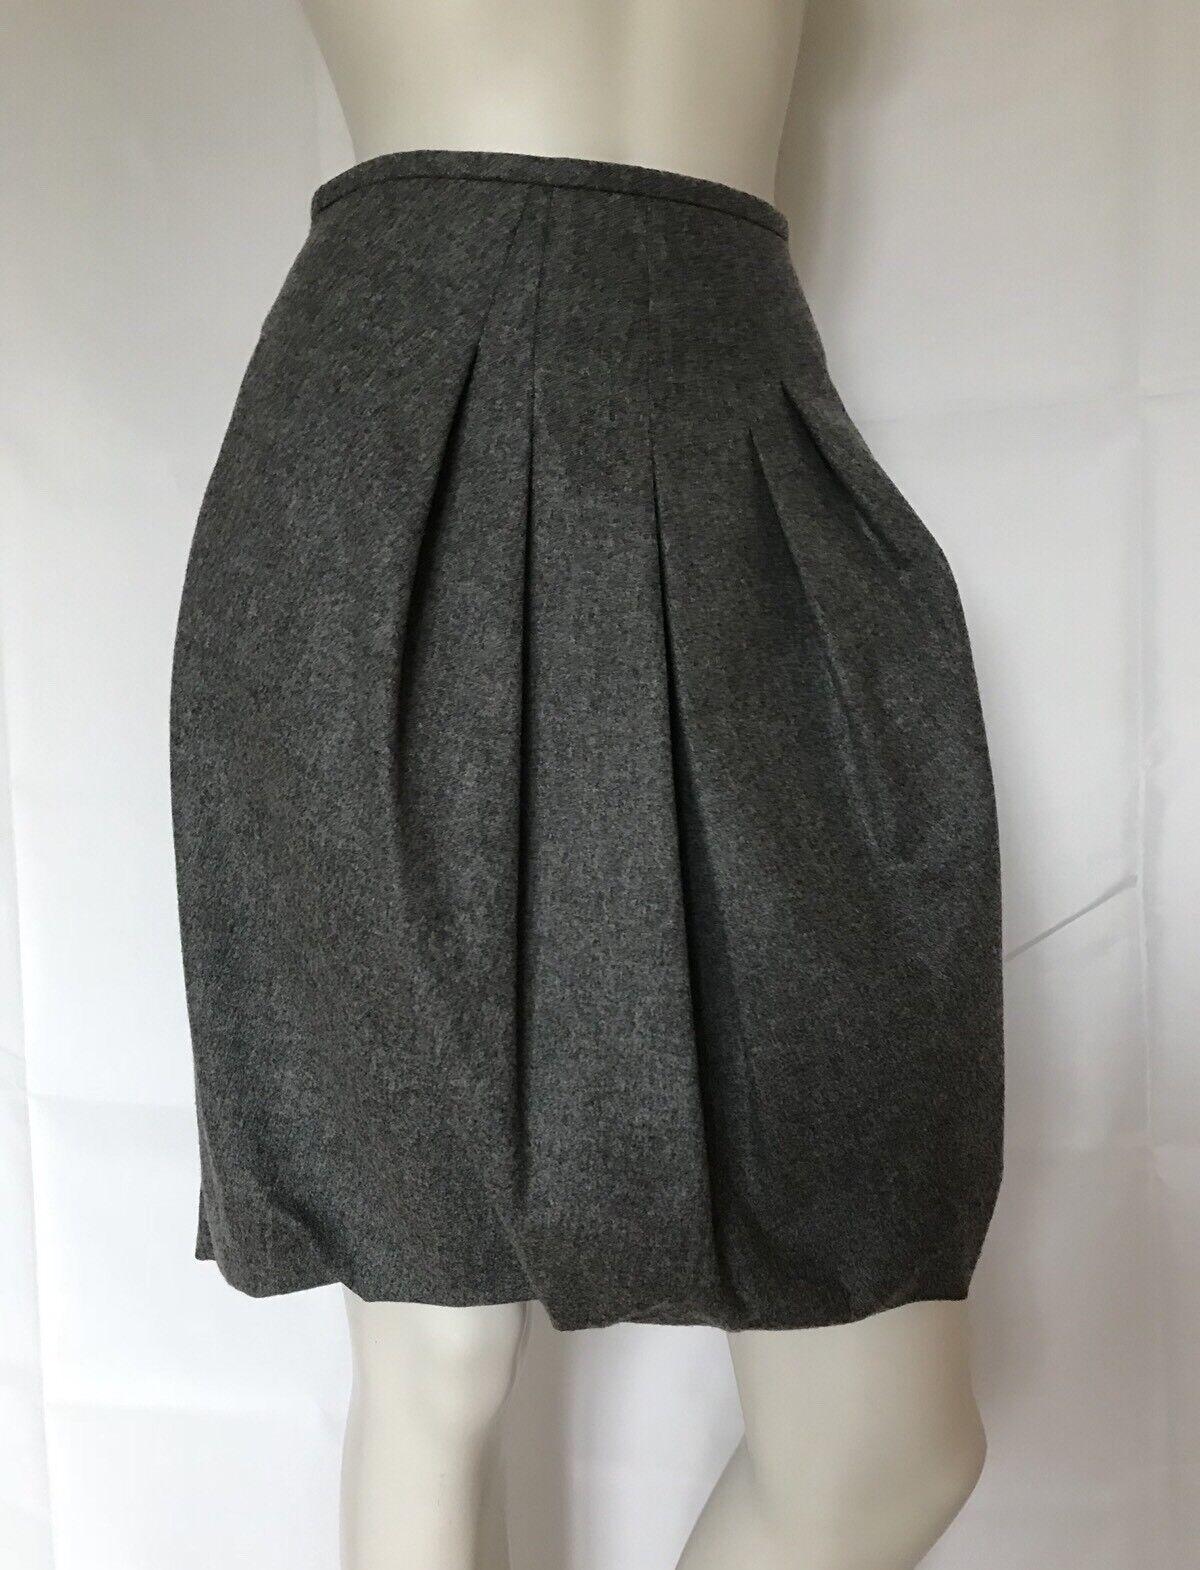 NWT Brunello Cucinelli GUNEX Lana Wool Pleated Buble Skirt Sz 40 US 4